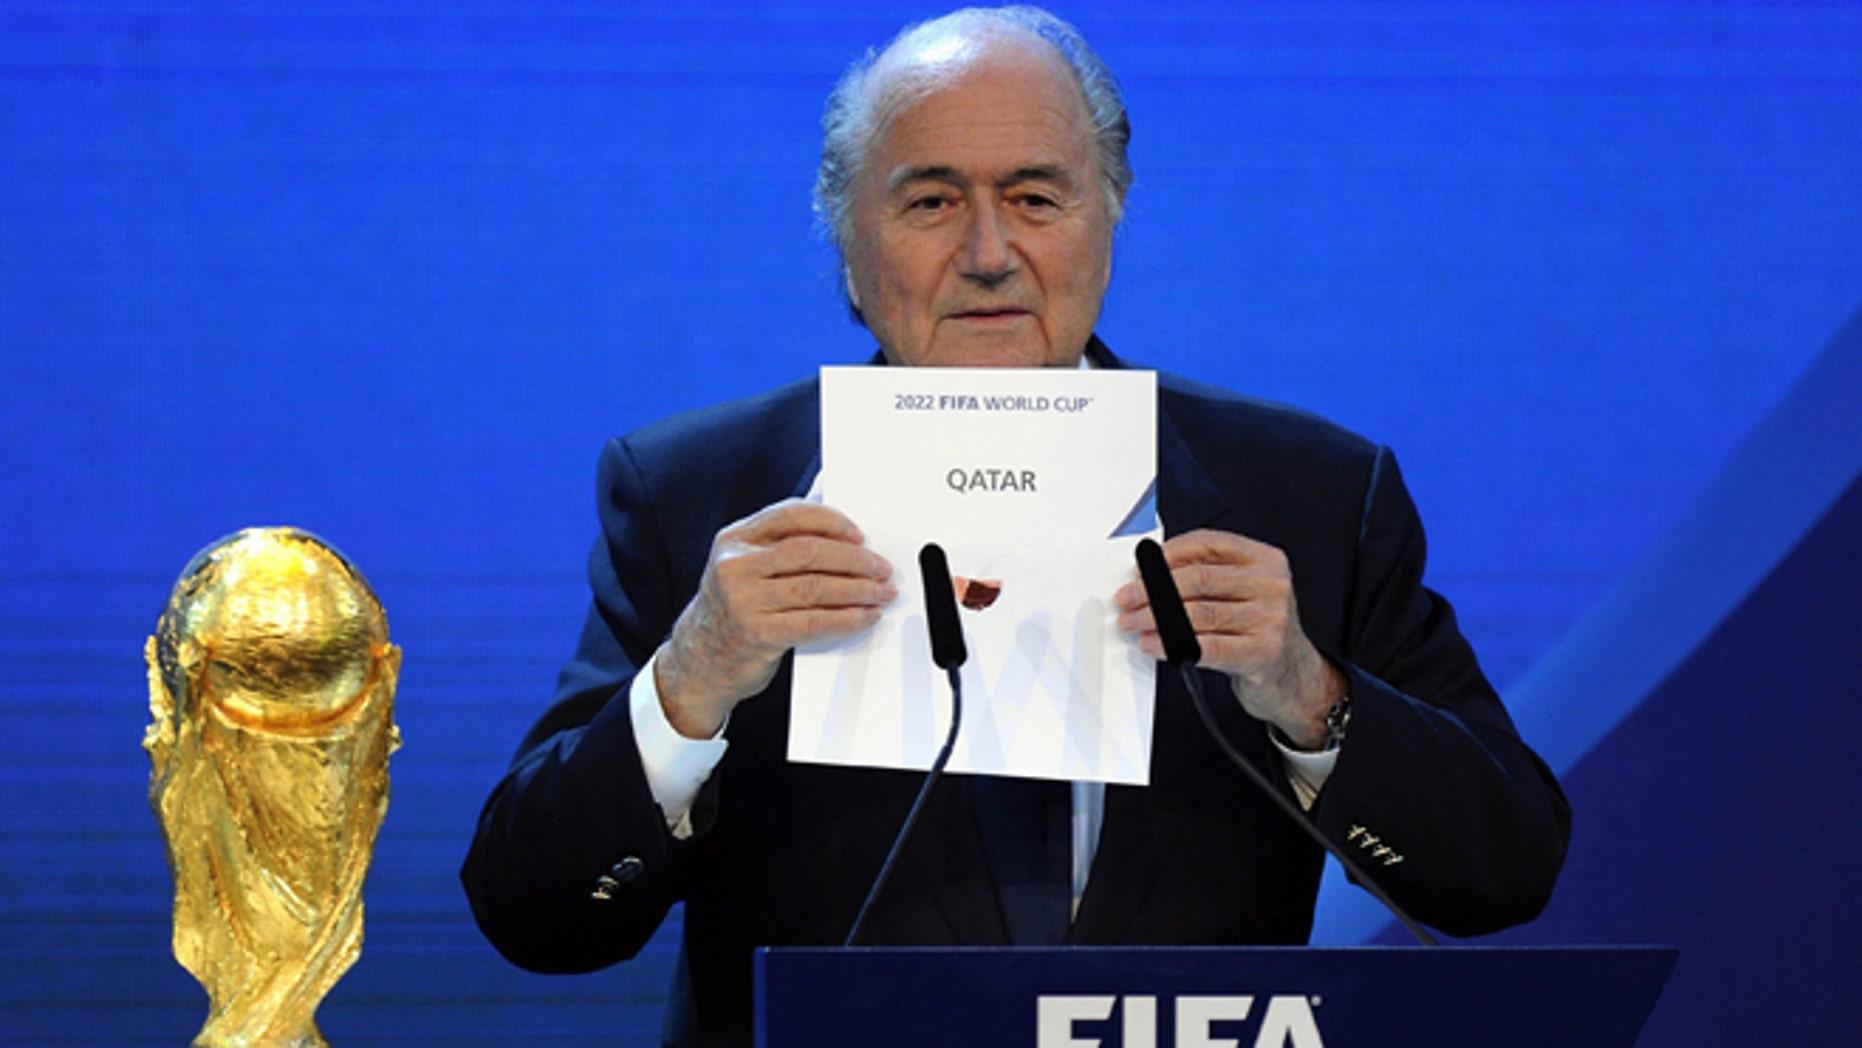 FIFA President Sepp Blatter in a Dec. 2010 file photo.